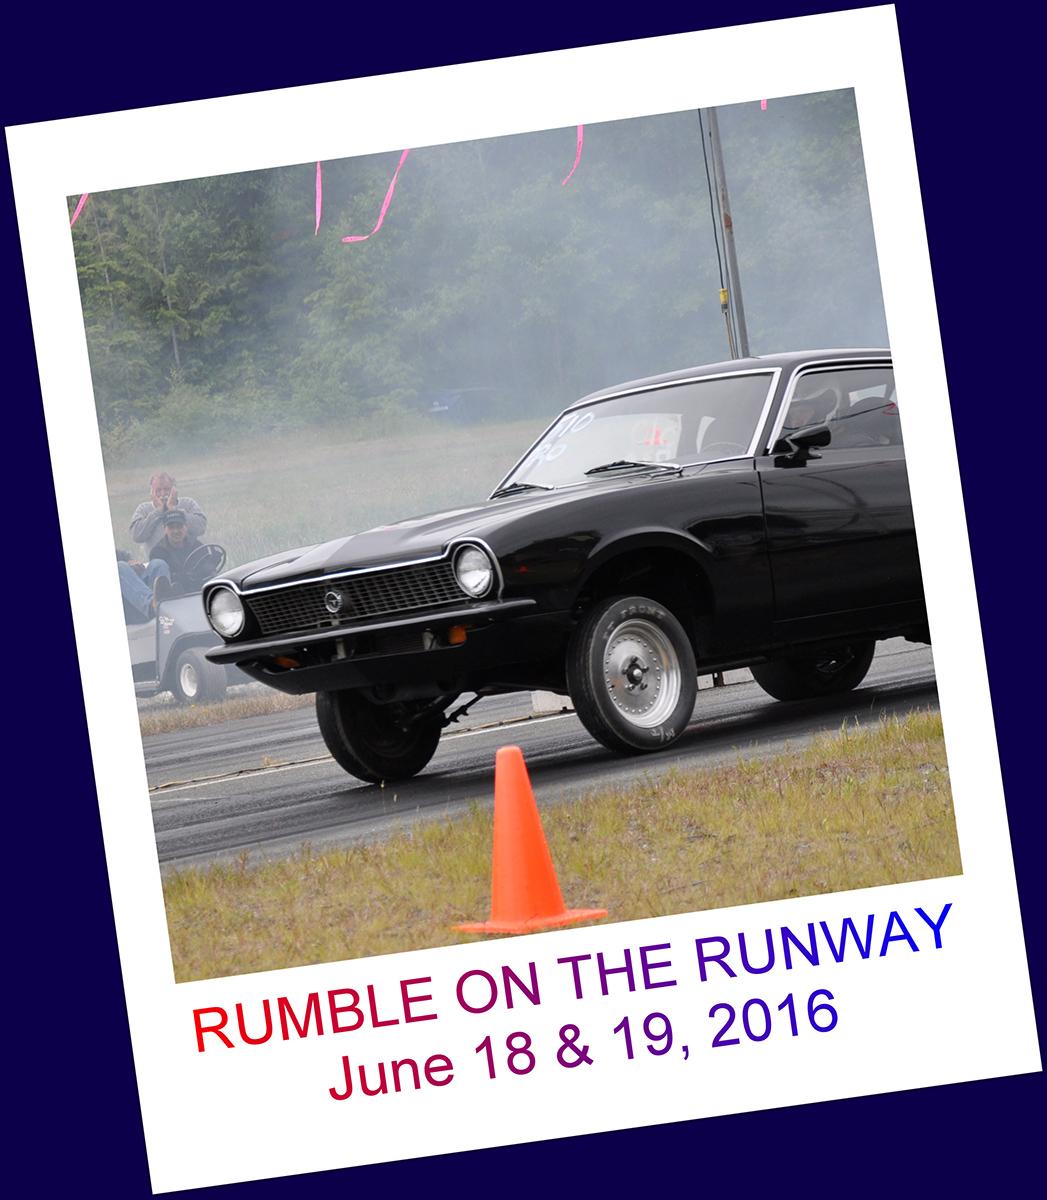 Rumble on the Runway June 18 & 19, 2016 1204